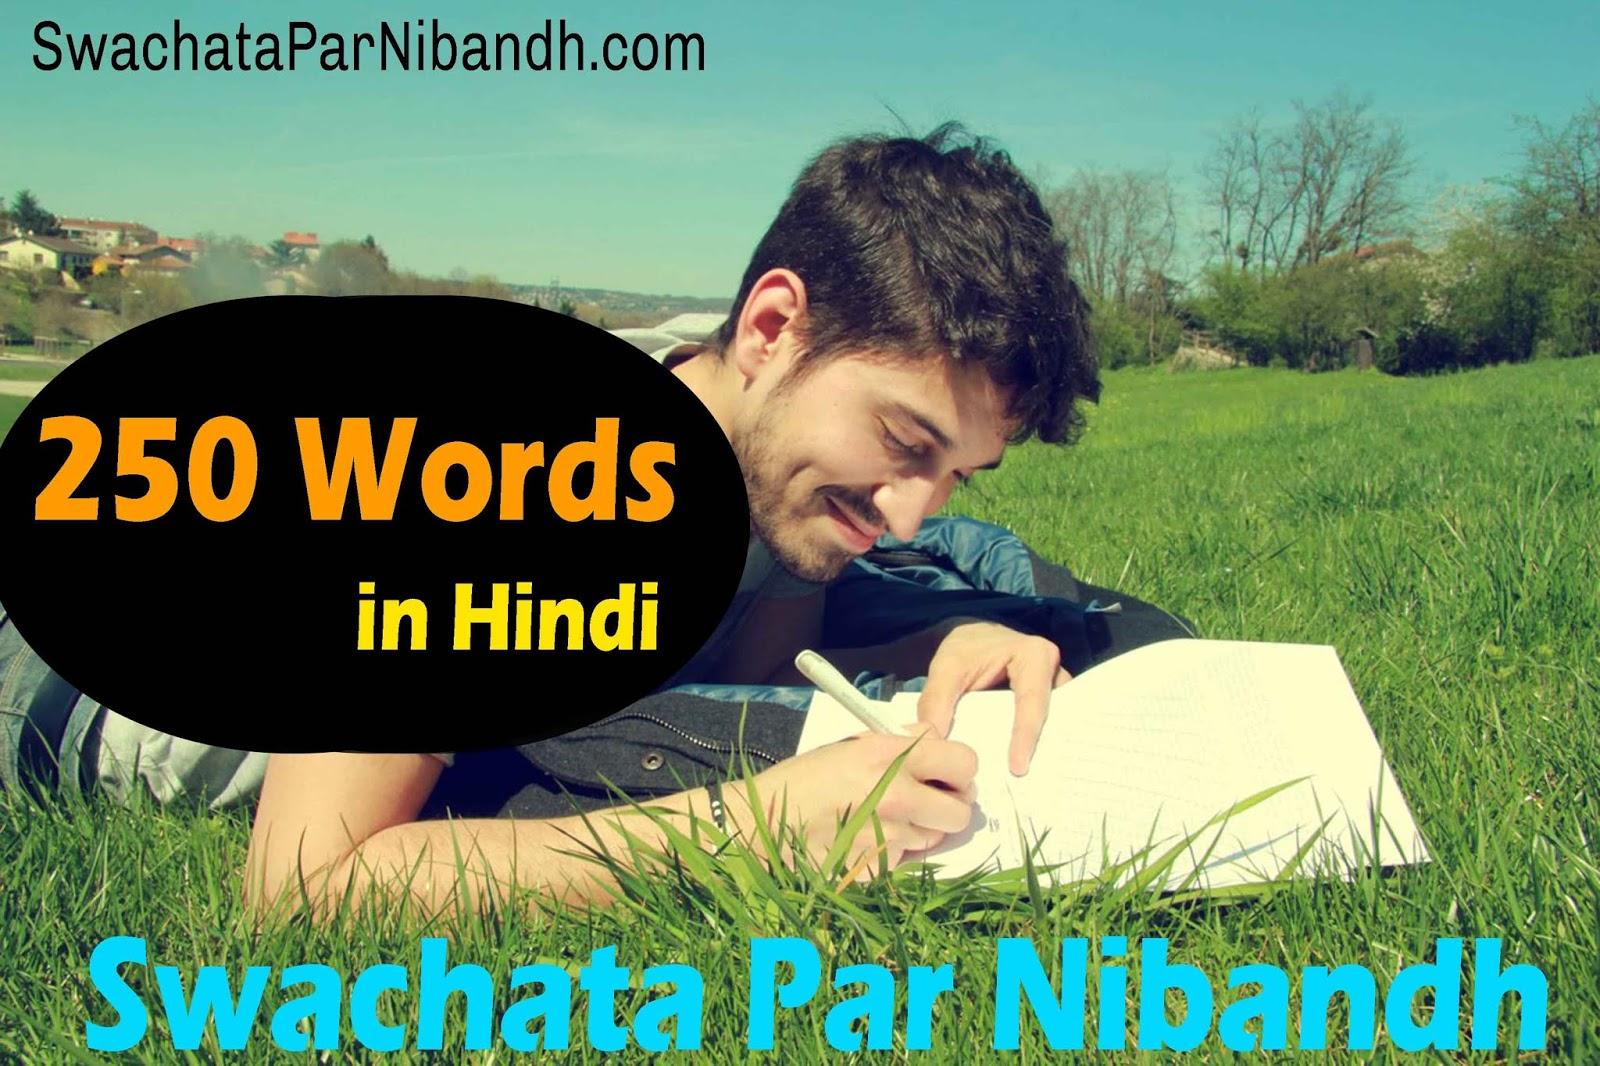 Swachata Ke Upar Nibandh 250 Words Hindi Mein, Swachata Par Nibandh 250 Shabad, Swachata के ऊपर निबंध 250 Words हिंदी में, SwachataParNibandh,